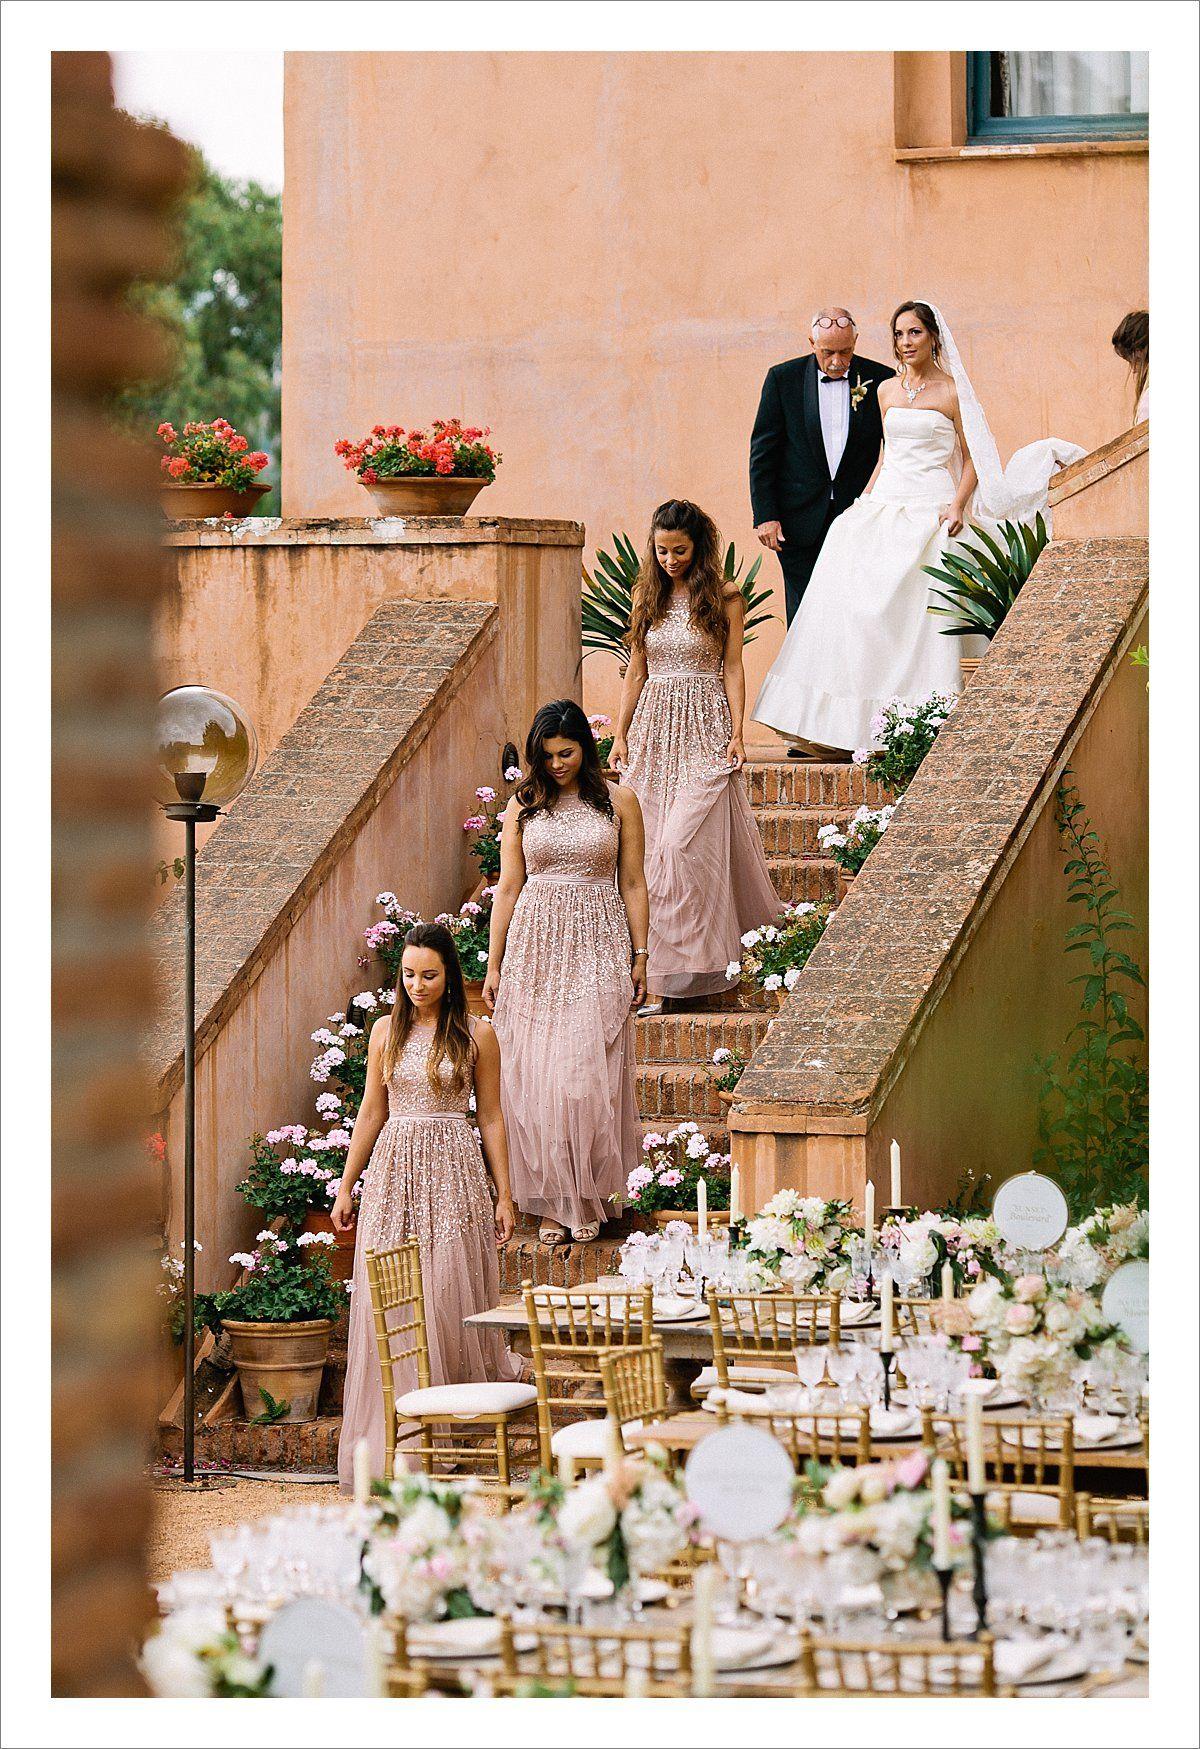 Castillo De Santa Catalina Malaga Wedding Spain 163400 Wedding